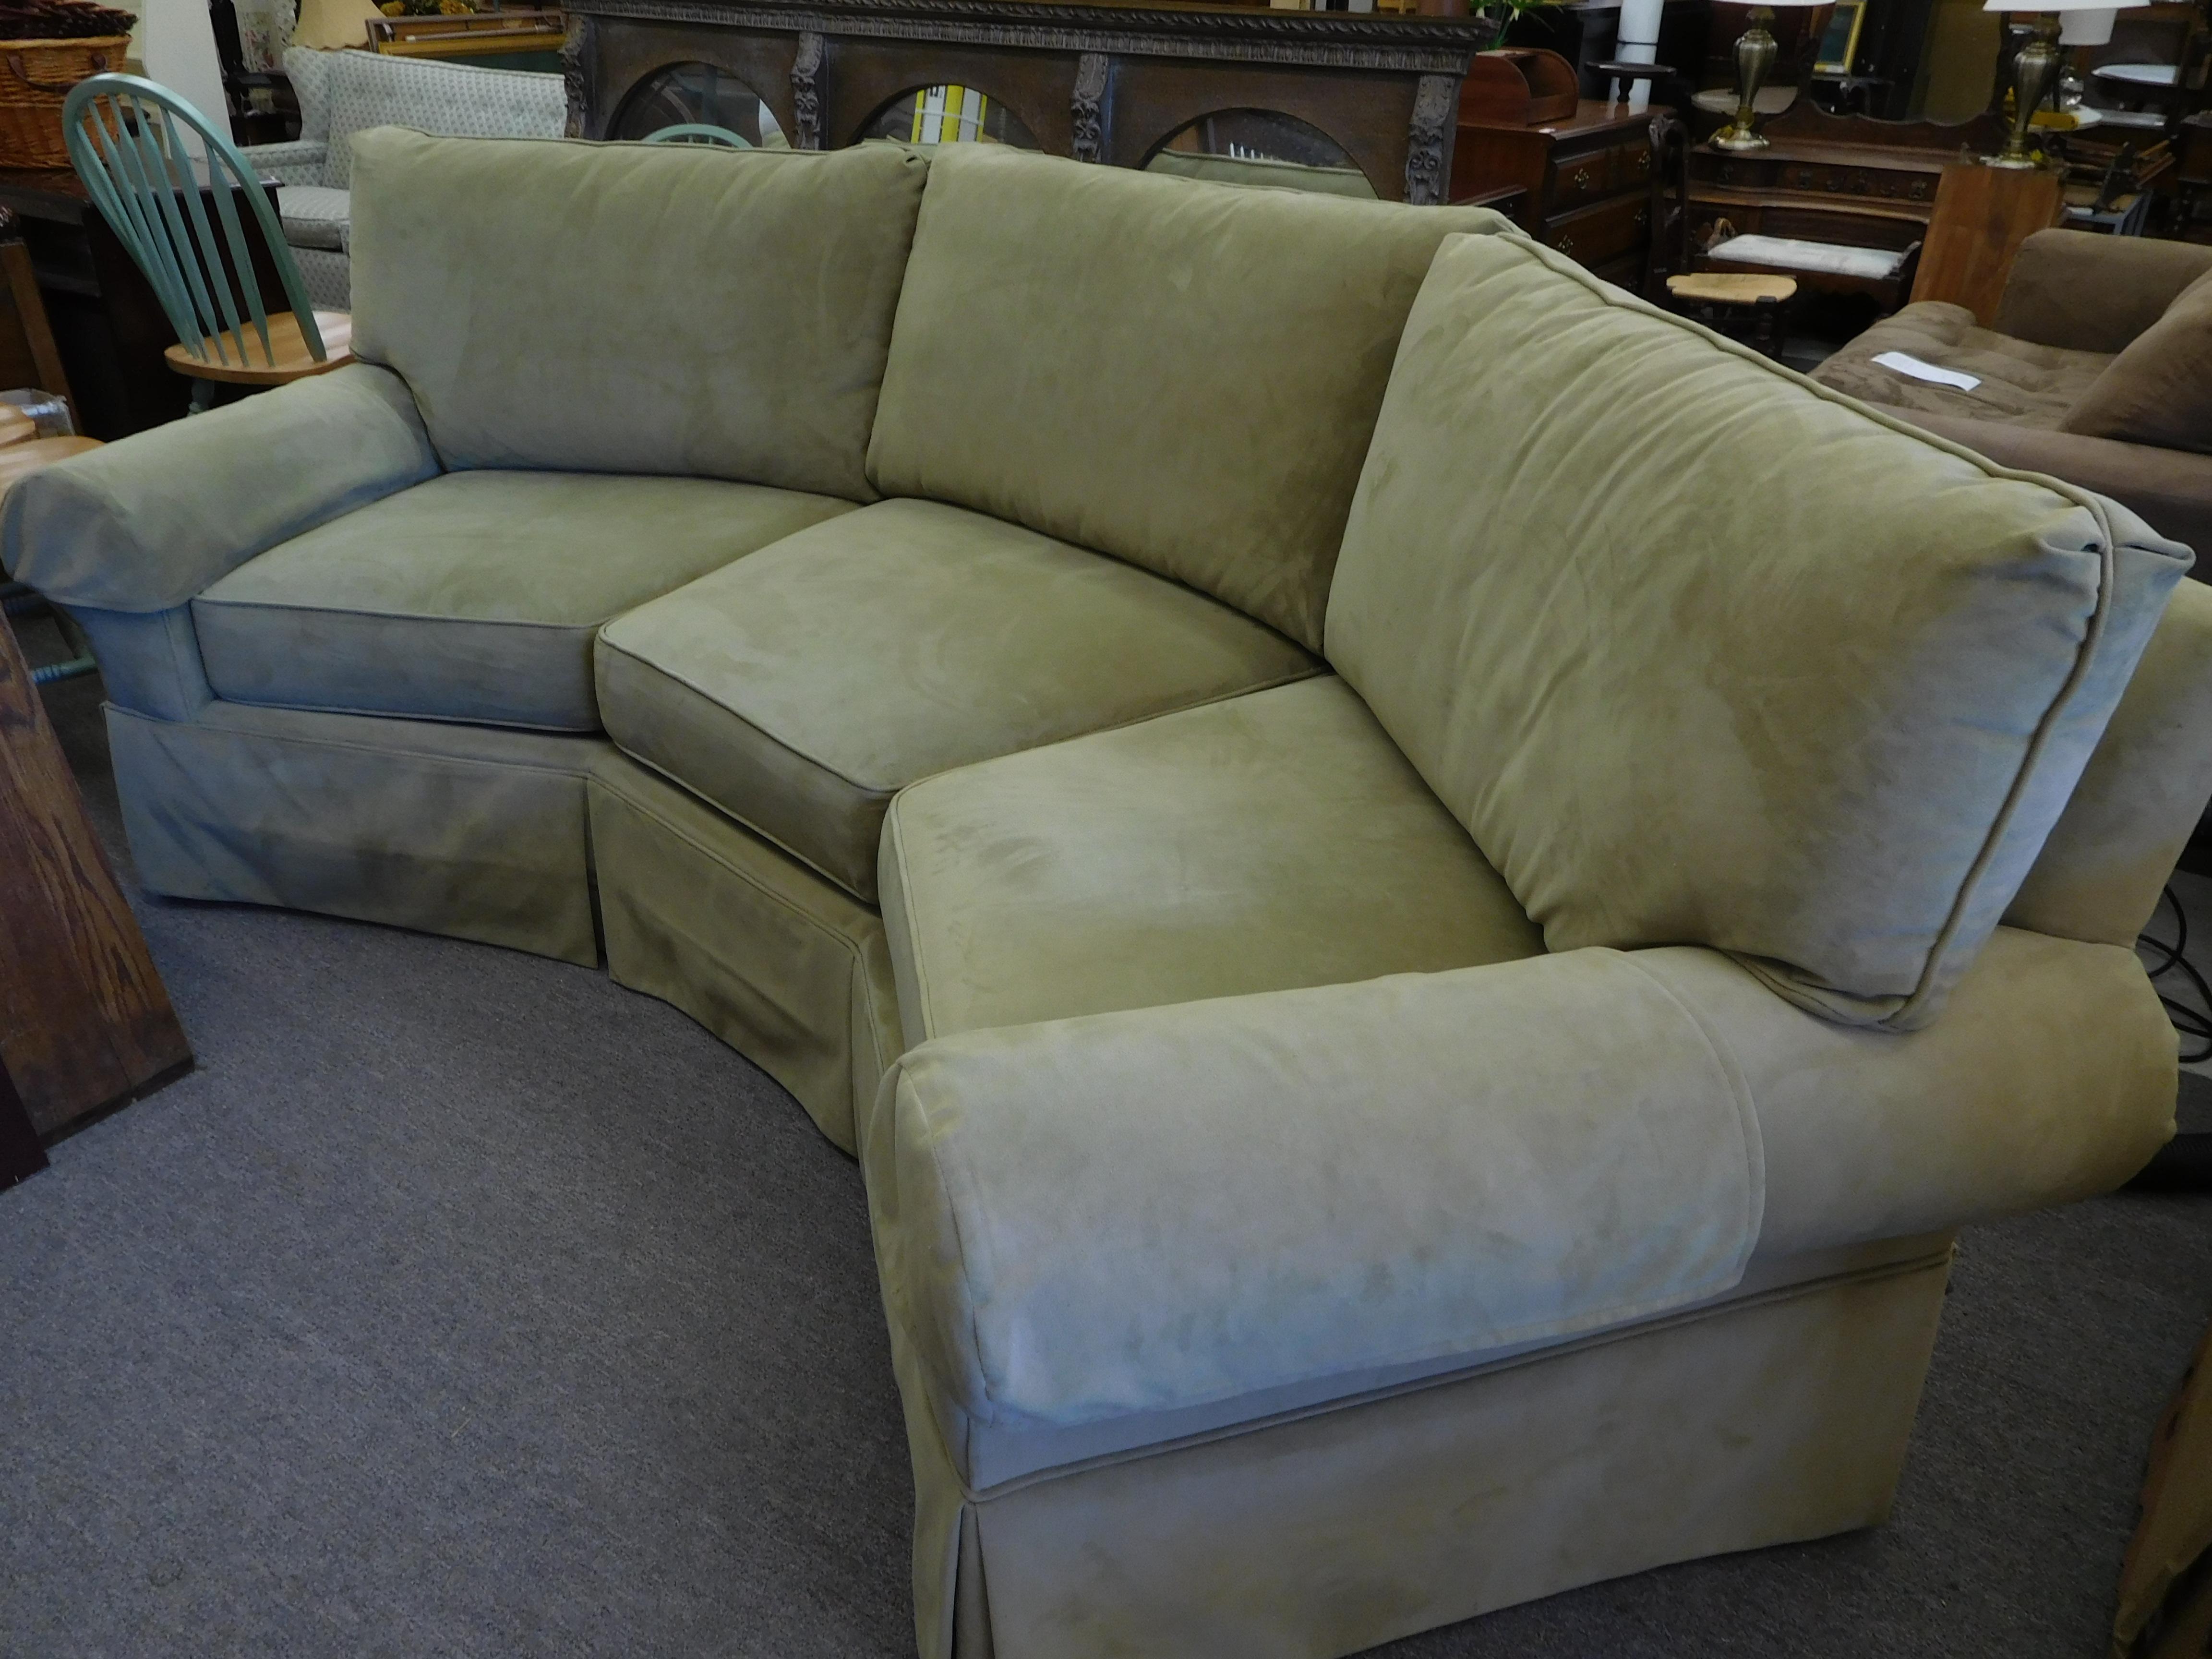 Soft Sage Micro Suede/Fiber Sofa by Jetton Furniture Co.